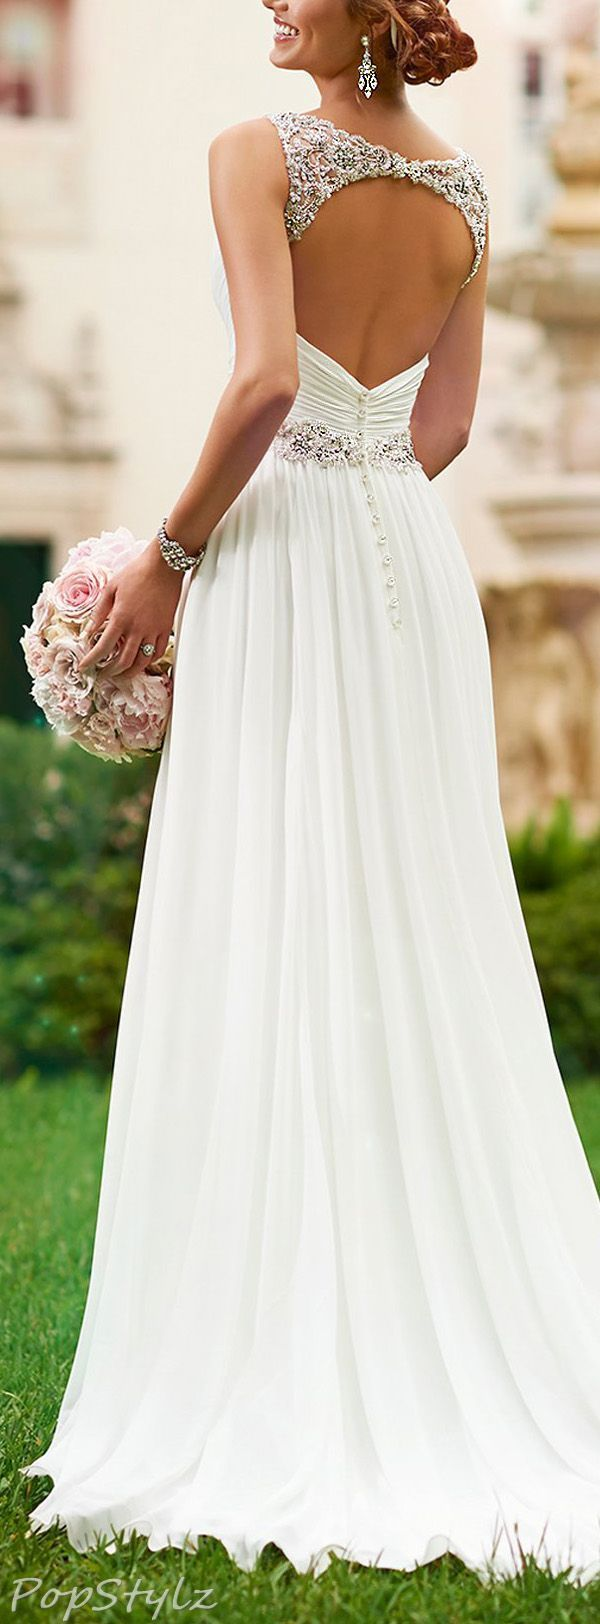 168 best Delectable Wedding Dresses images on Pinterest | Wedding ...